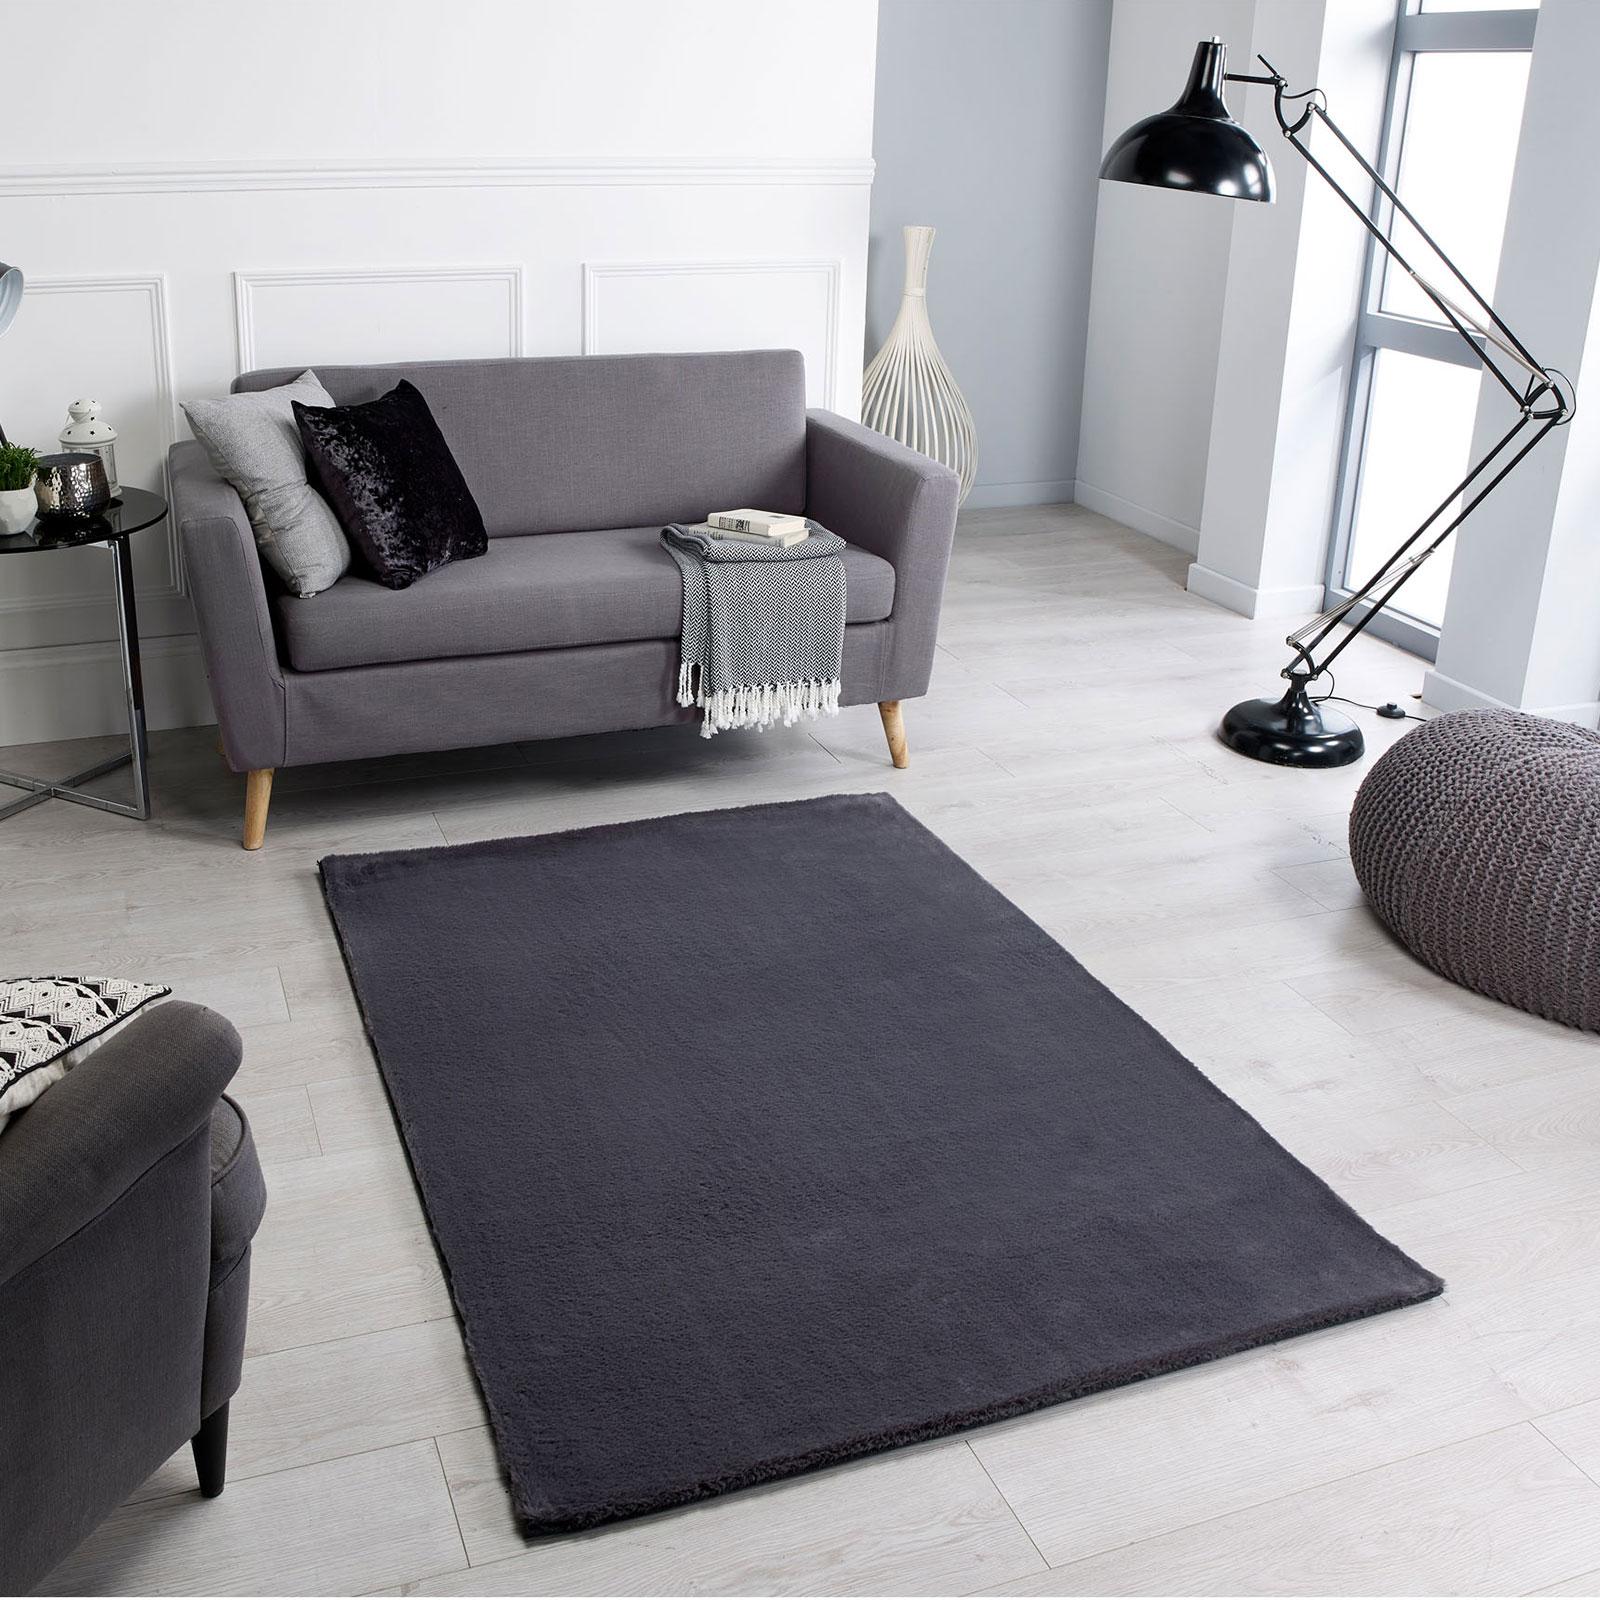 Comfy-Charcoal-Roomshot.jpg